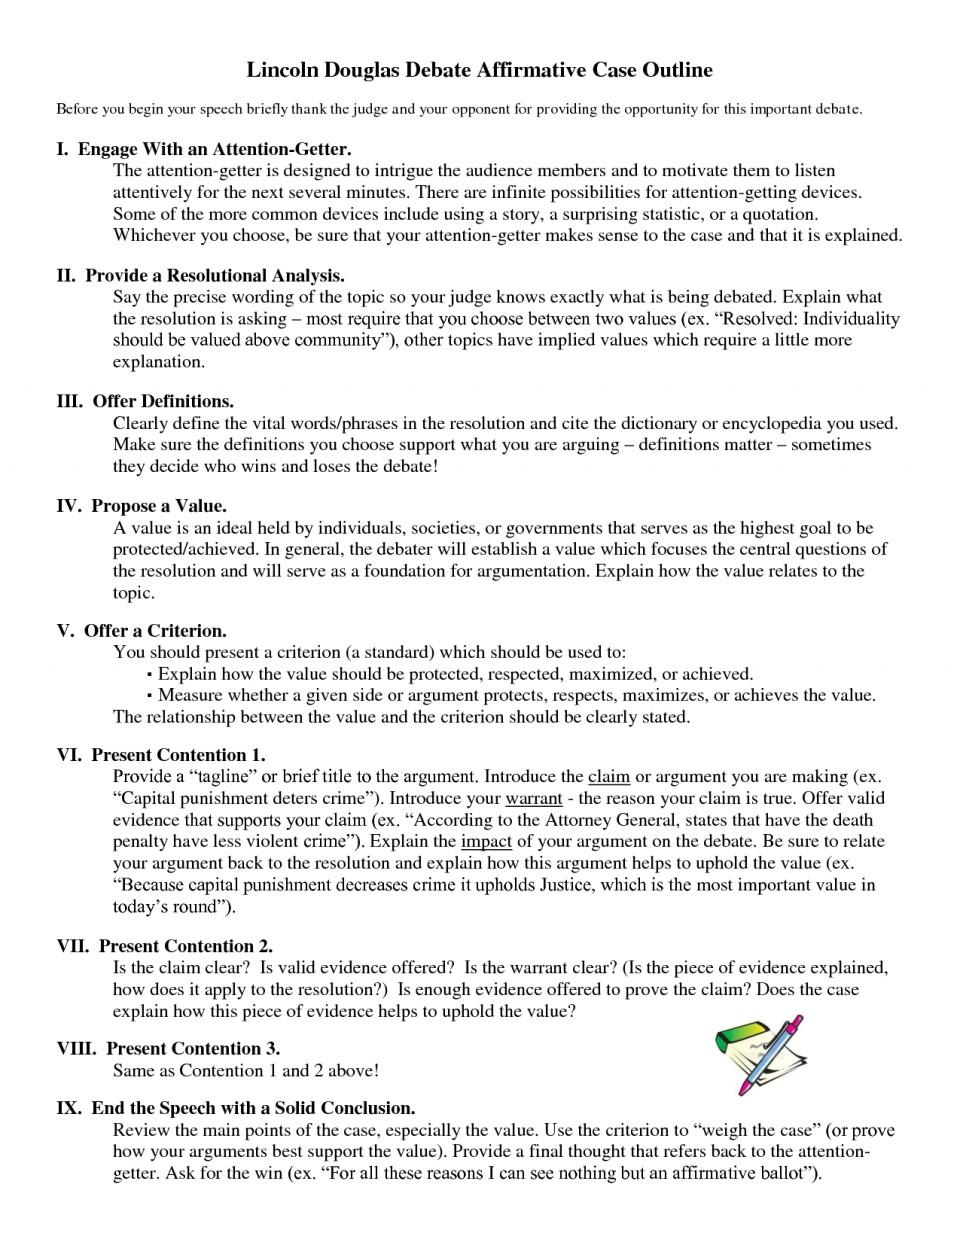 007 Debate Essay Topics Example Lincoln Douglas Affirmative Marvelous Prompts Persuasive High School 960